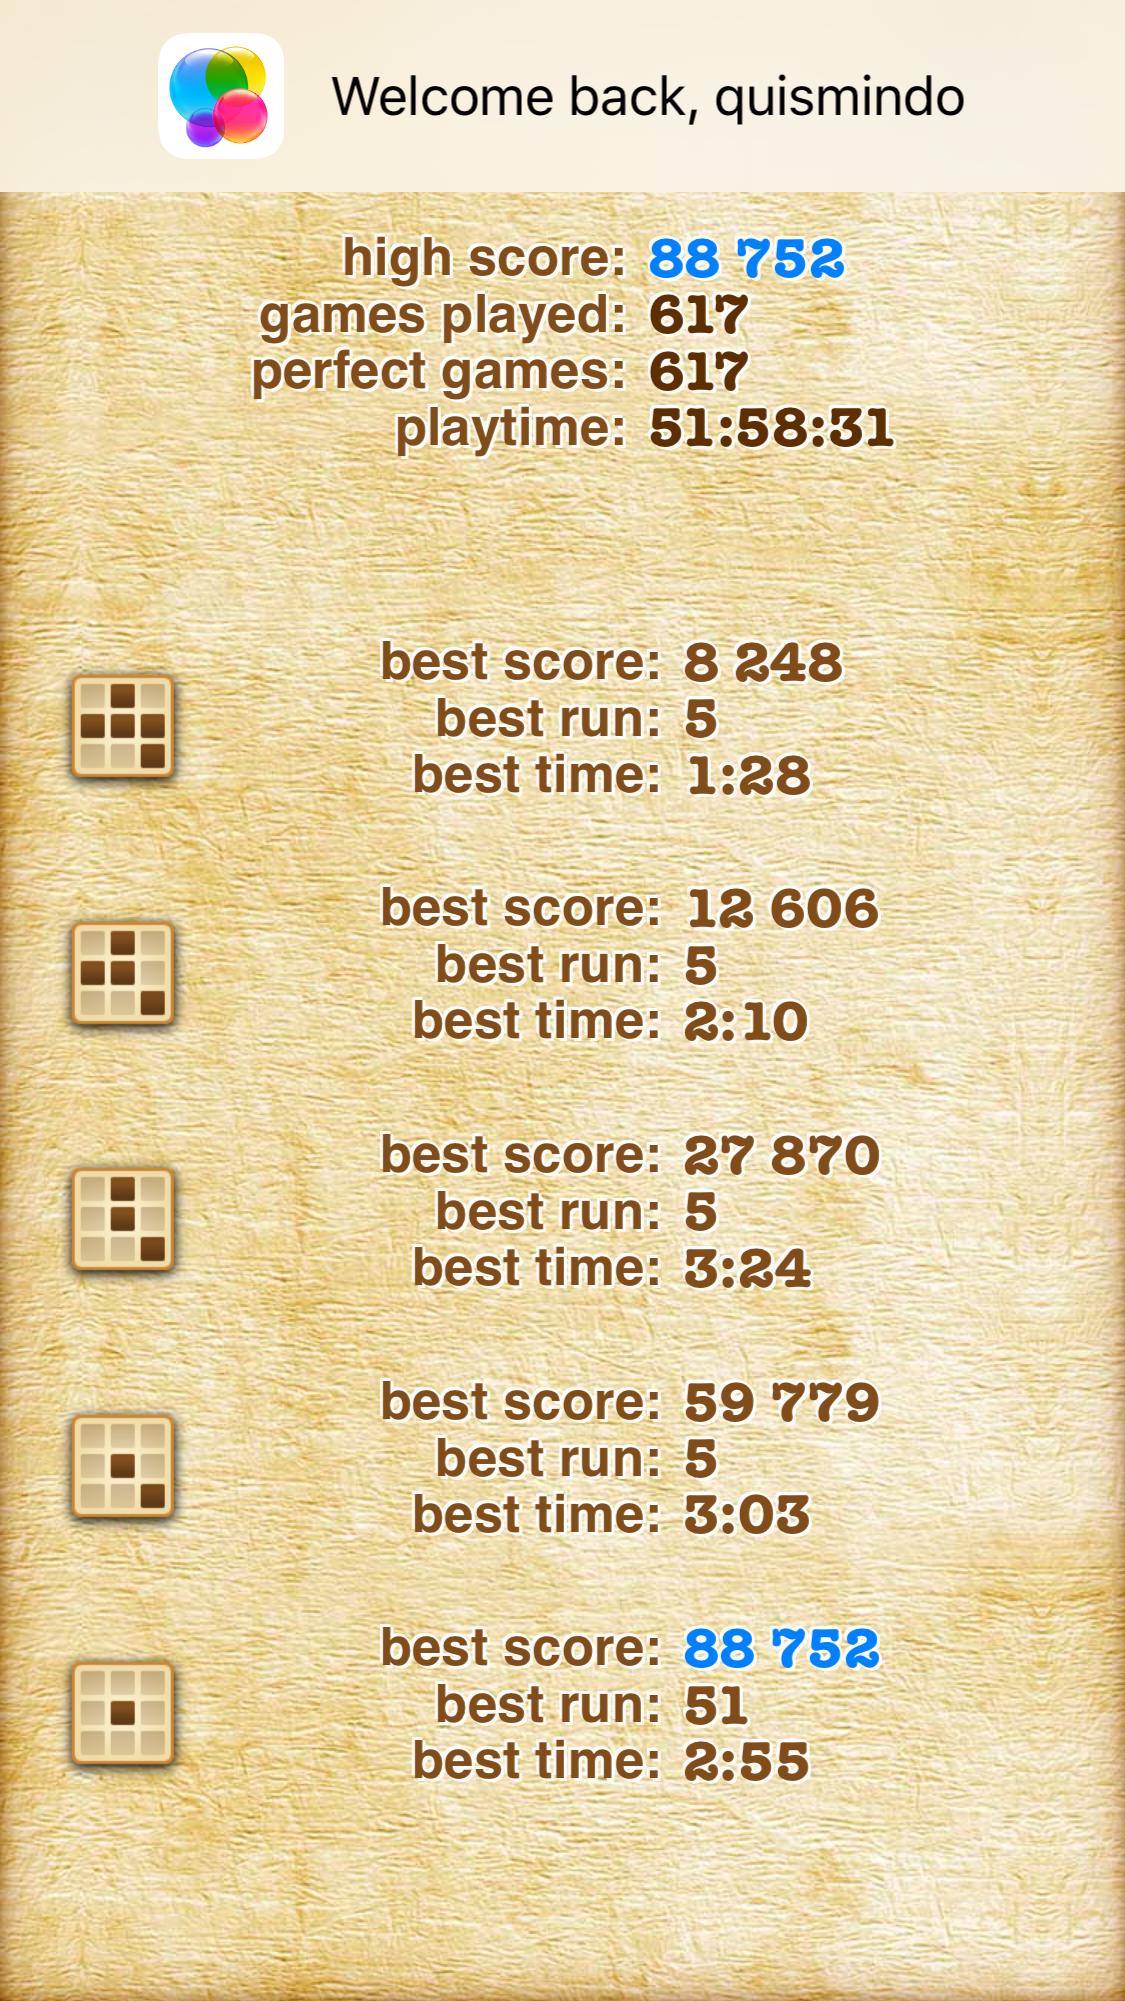 Maxwel: Sudoku 2 Pro [Hard] (iOS) 59,779 points on 2016-01-31 11:31:33